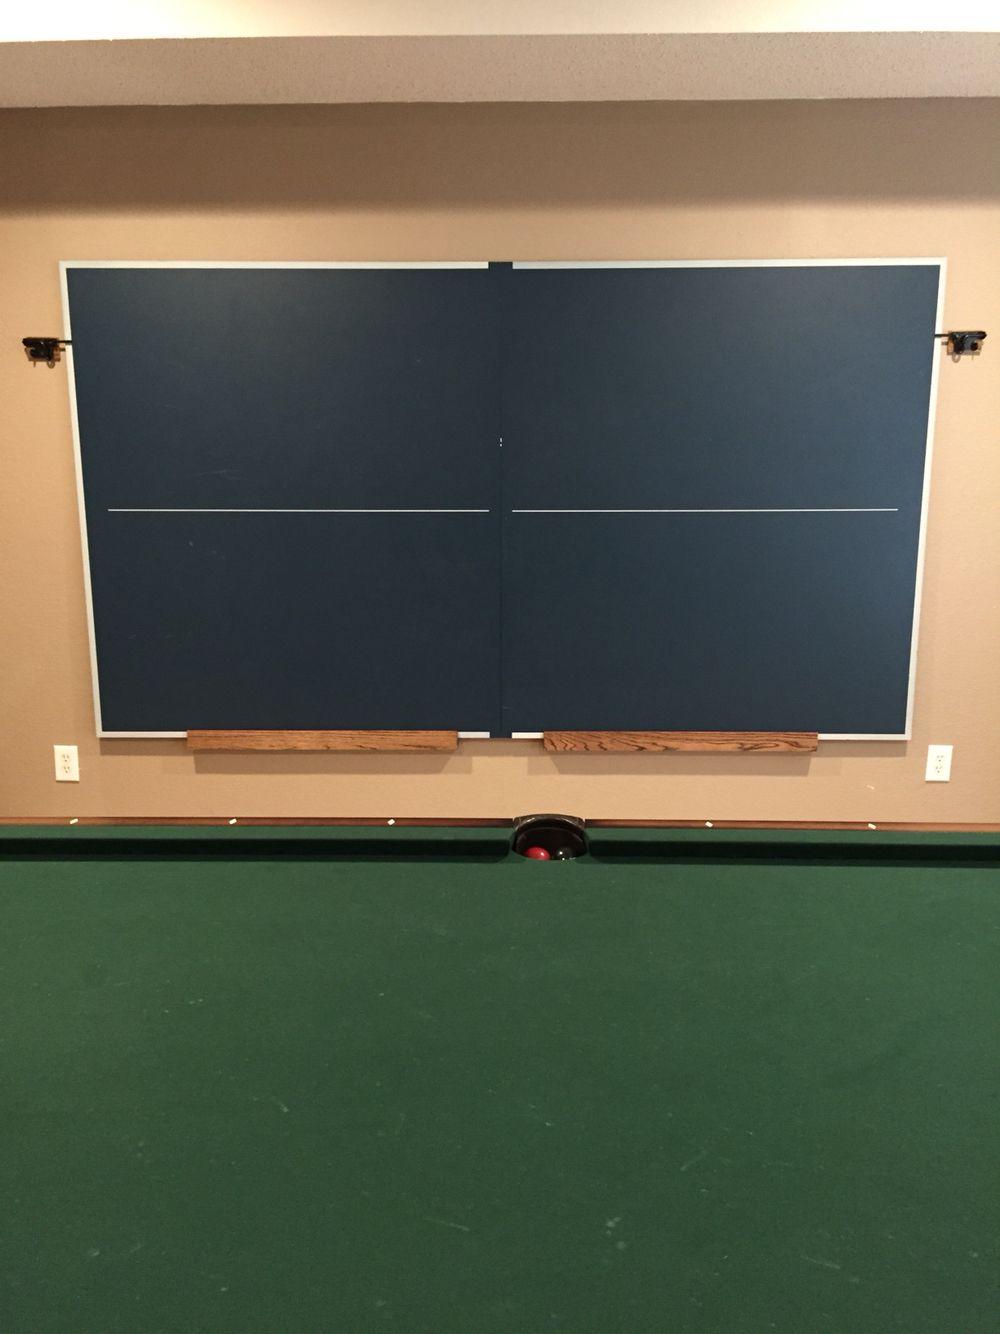 Ping Pong Table Storage Wall Art Basement Ideas Pinte - Pool table storage ideas